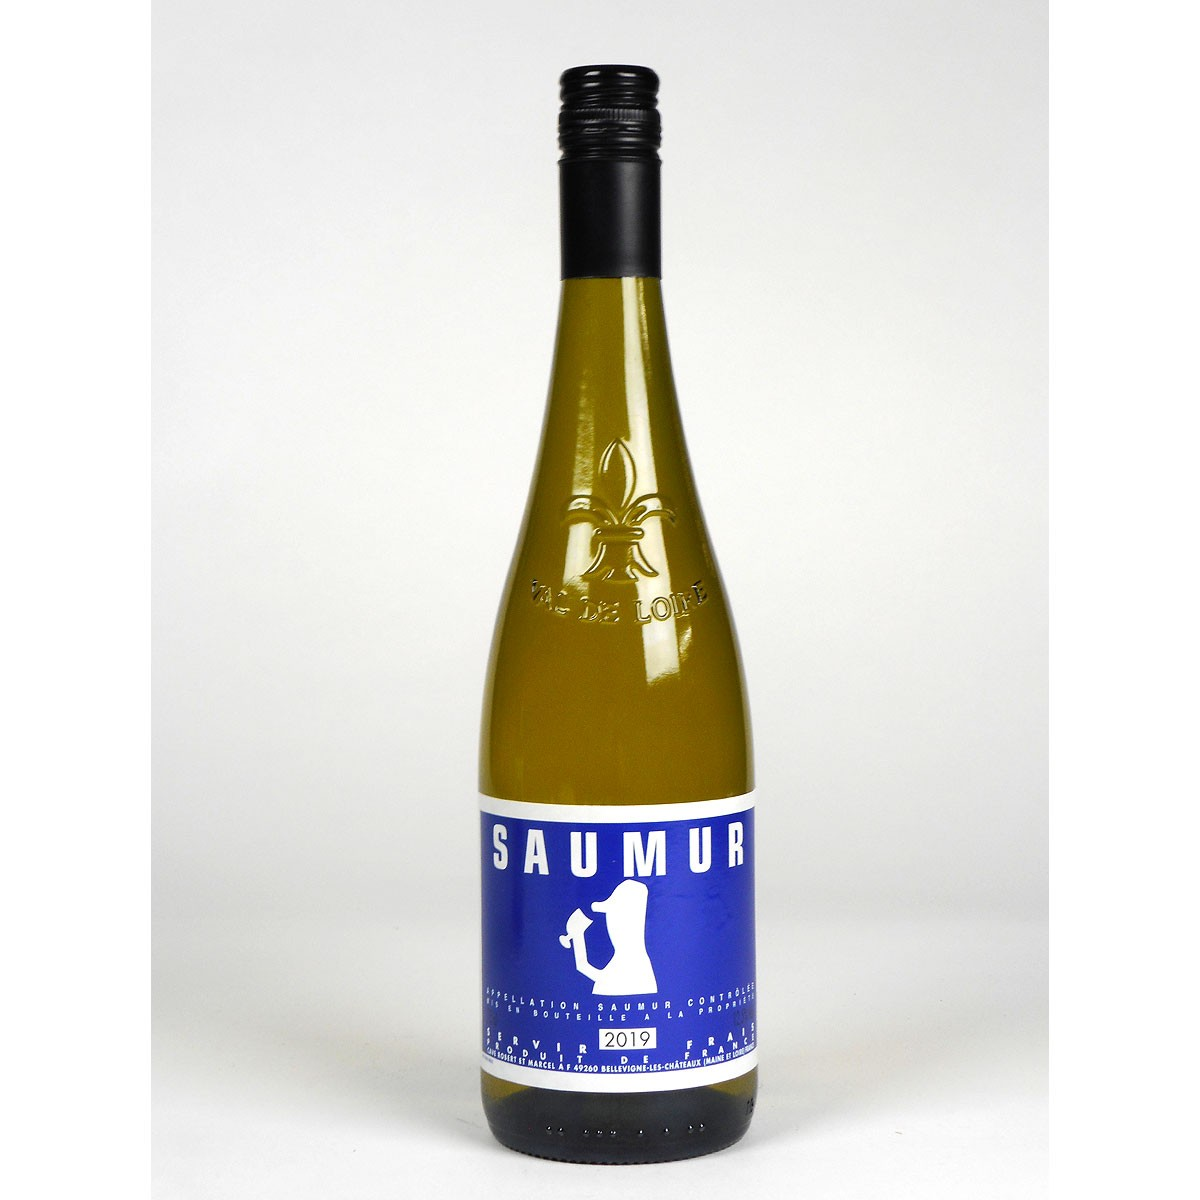 Saumur Blanc 2019 - Bottle